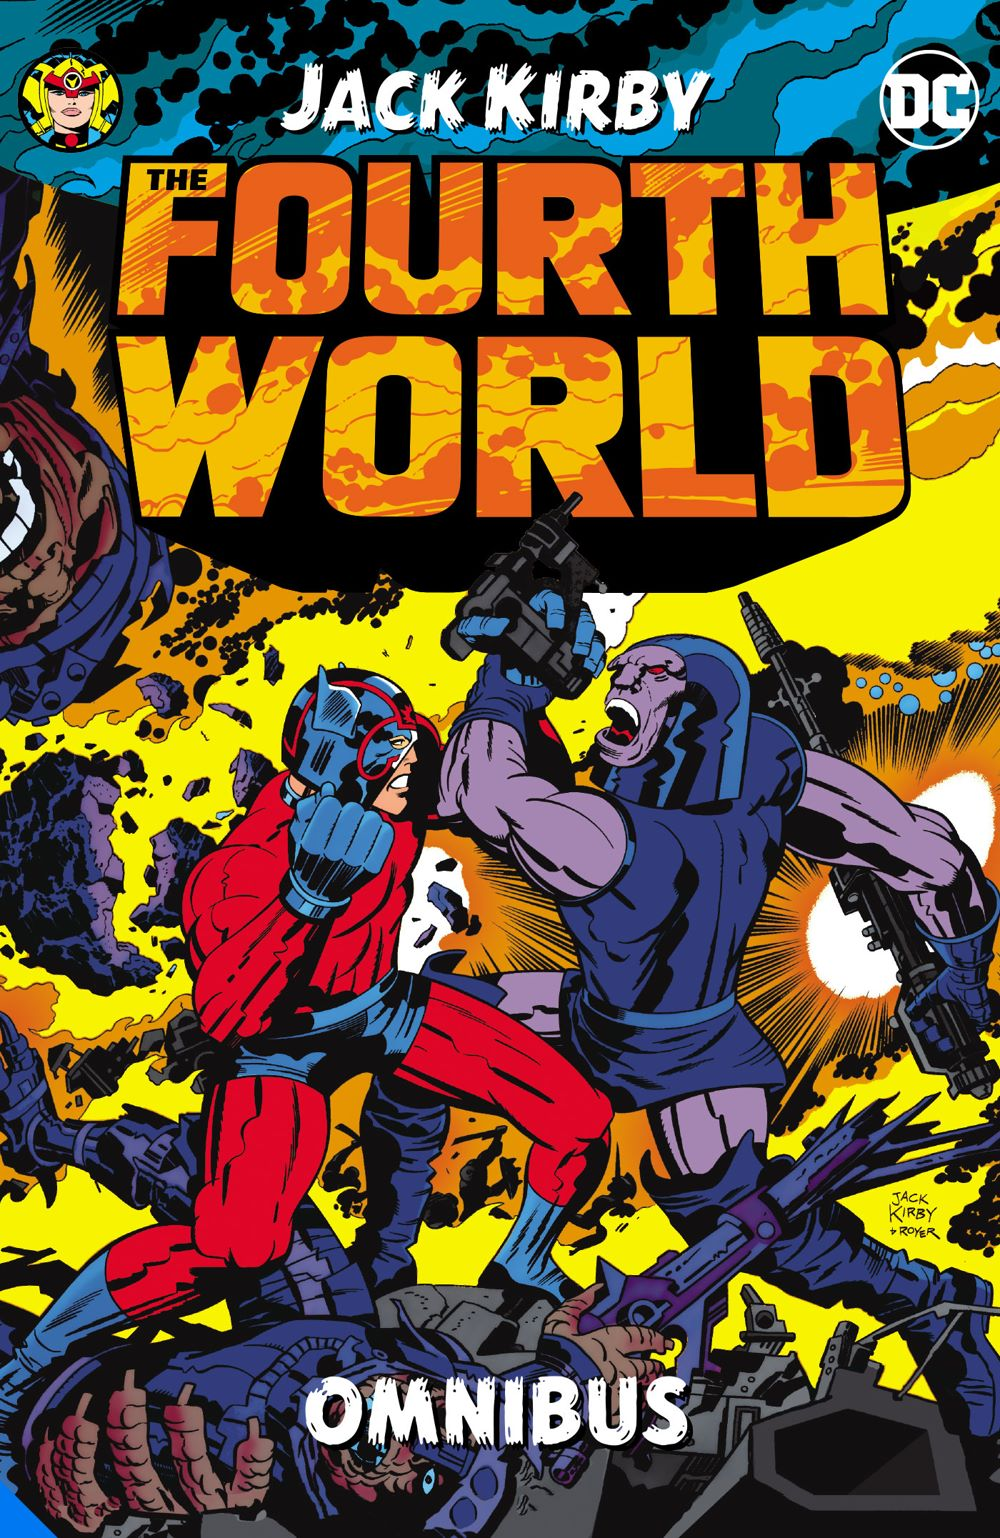 fourthworldbyjackkirby-omni_adv DC Comics July 2021 Solicitations